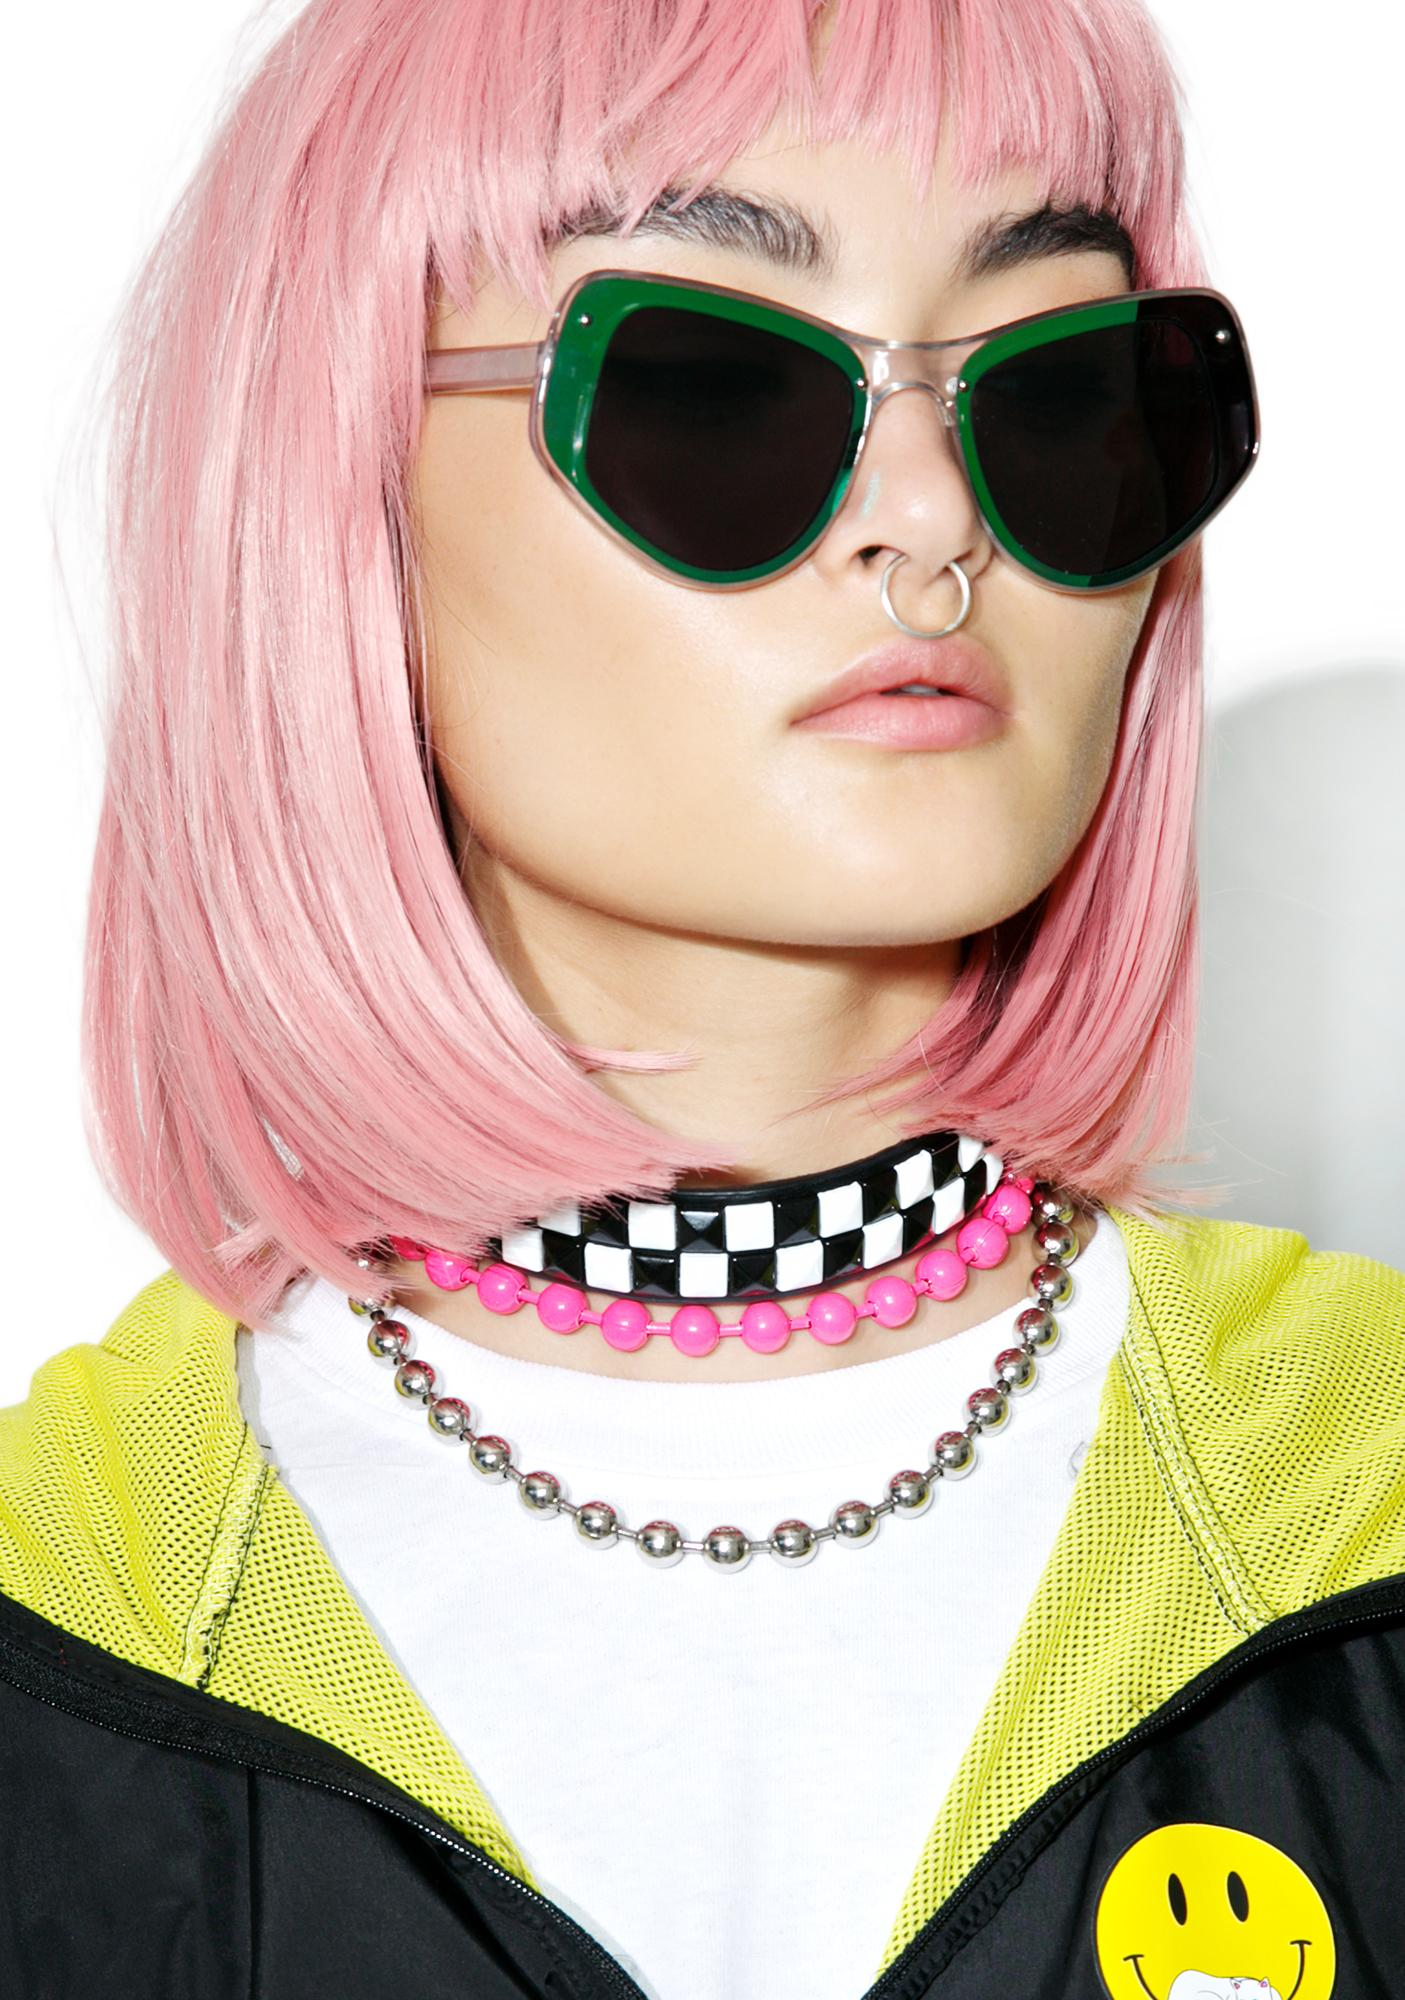 Spitfire Ultra Sunglasses